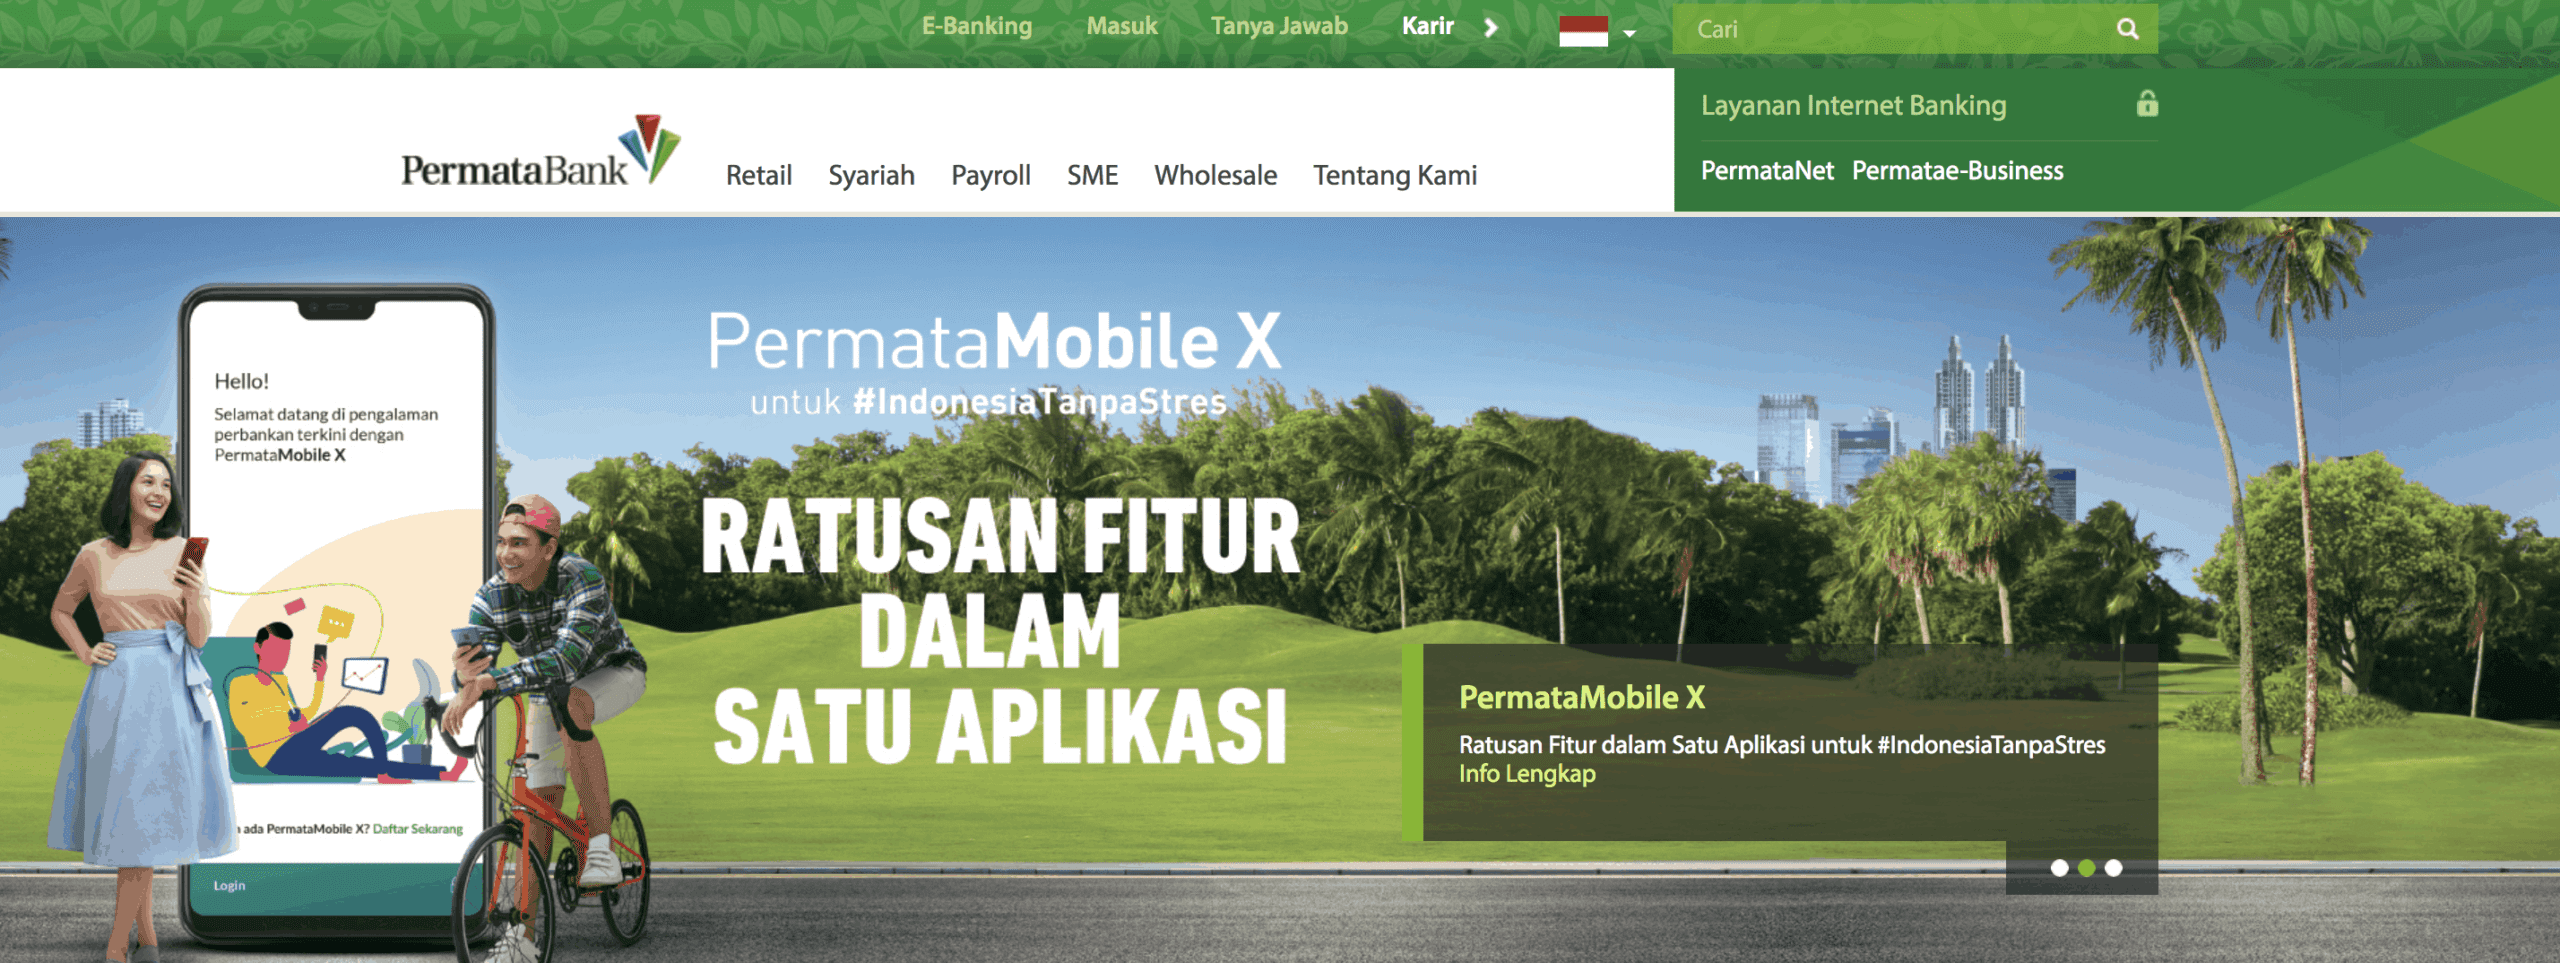 aplikasi mobile banking terbaik bank permata